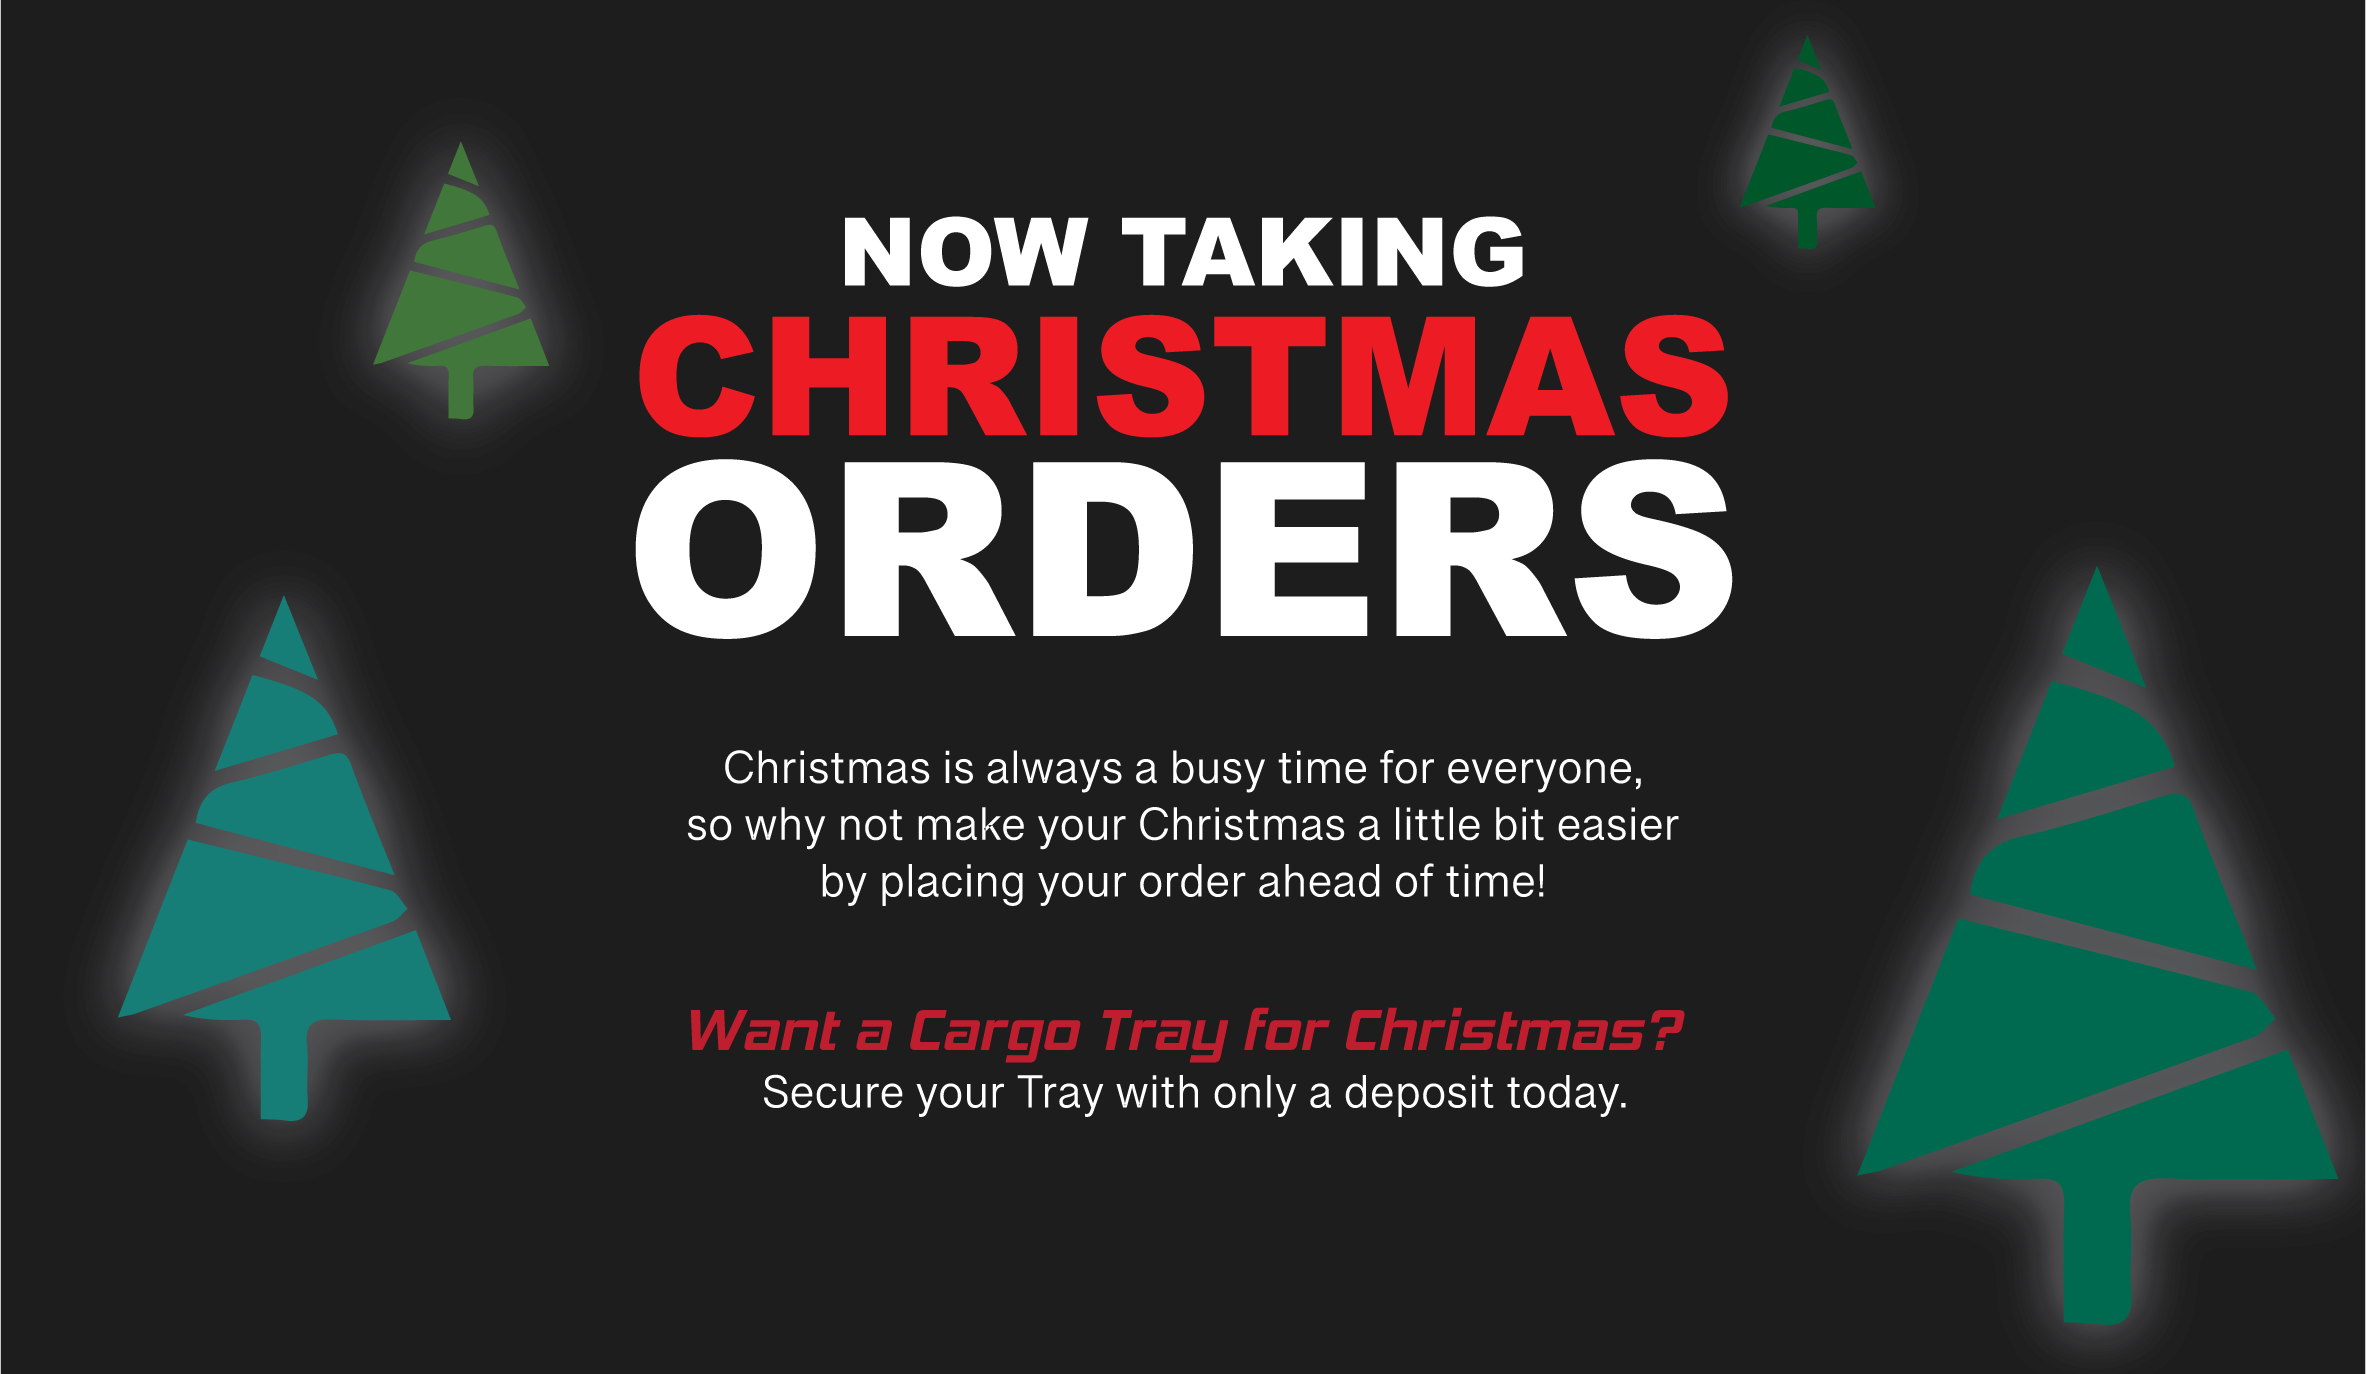 Ezi Reach Cargo Tray Christmas Orders